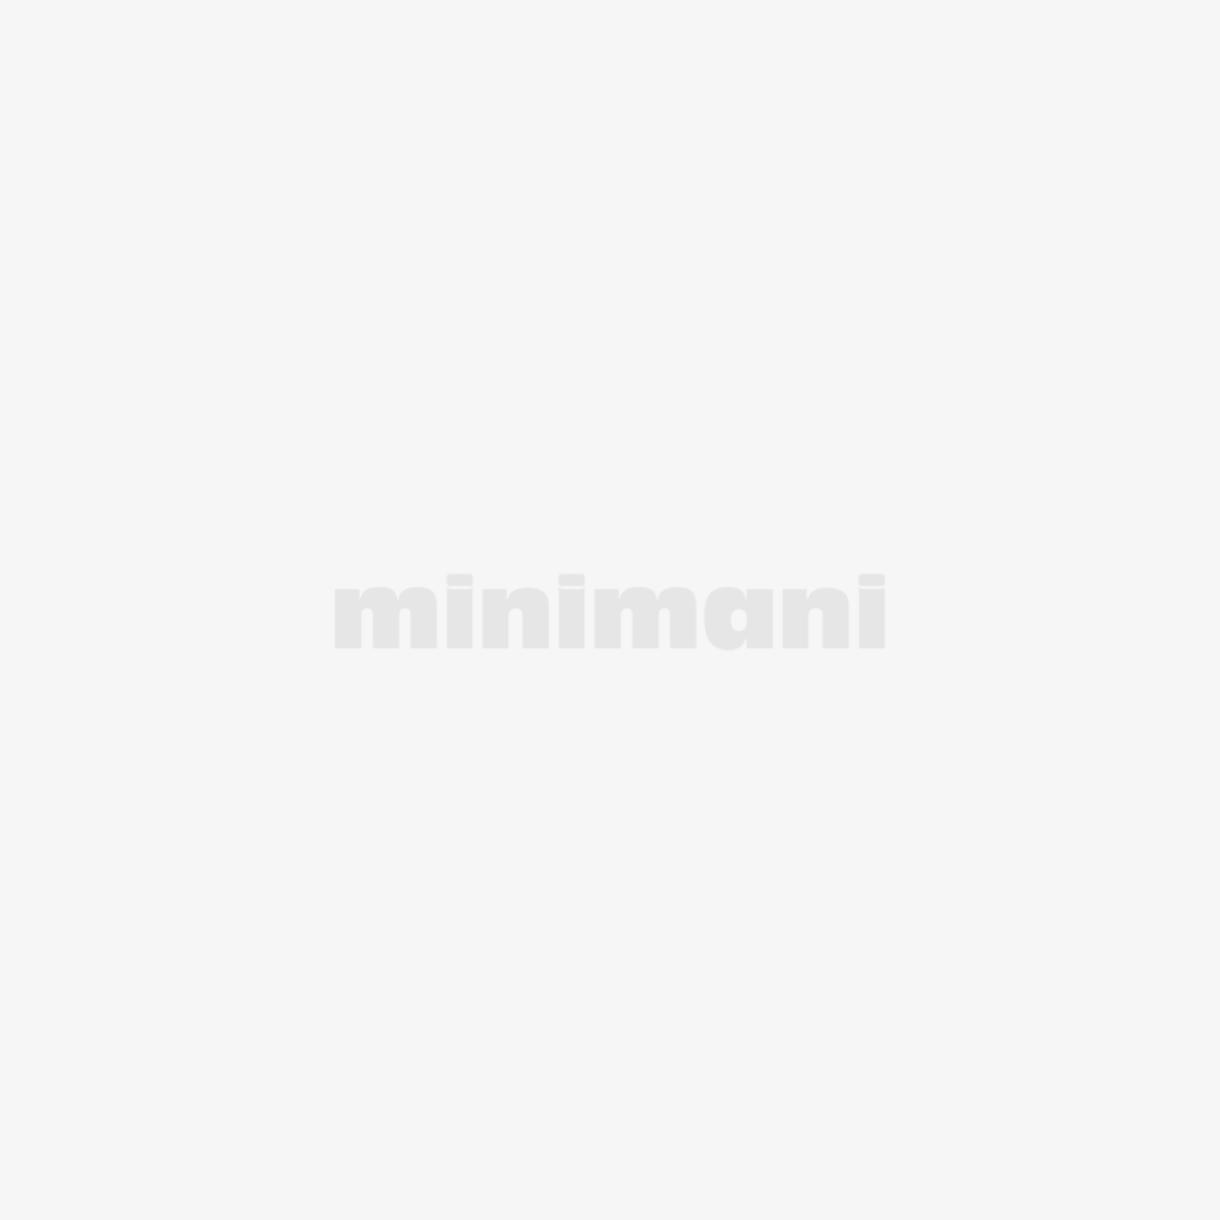 RAVENSBURGER STATUE OF LIBERTY -